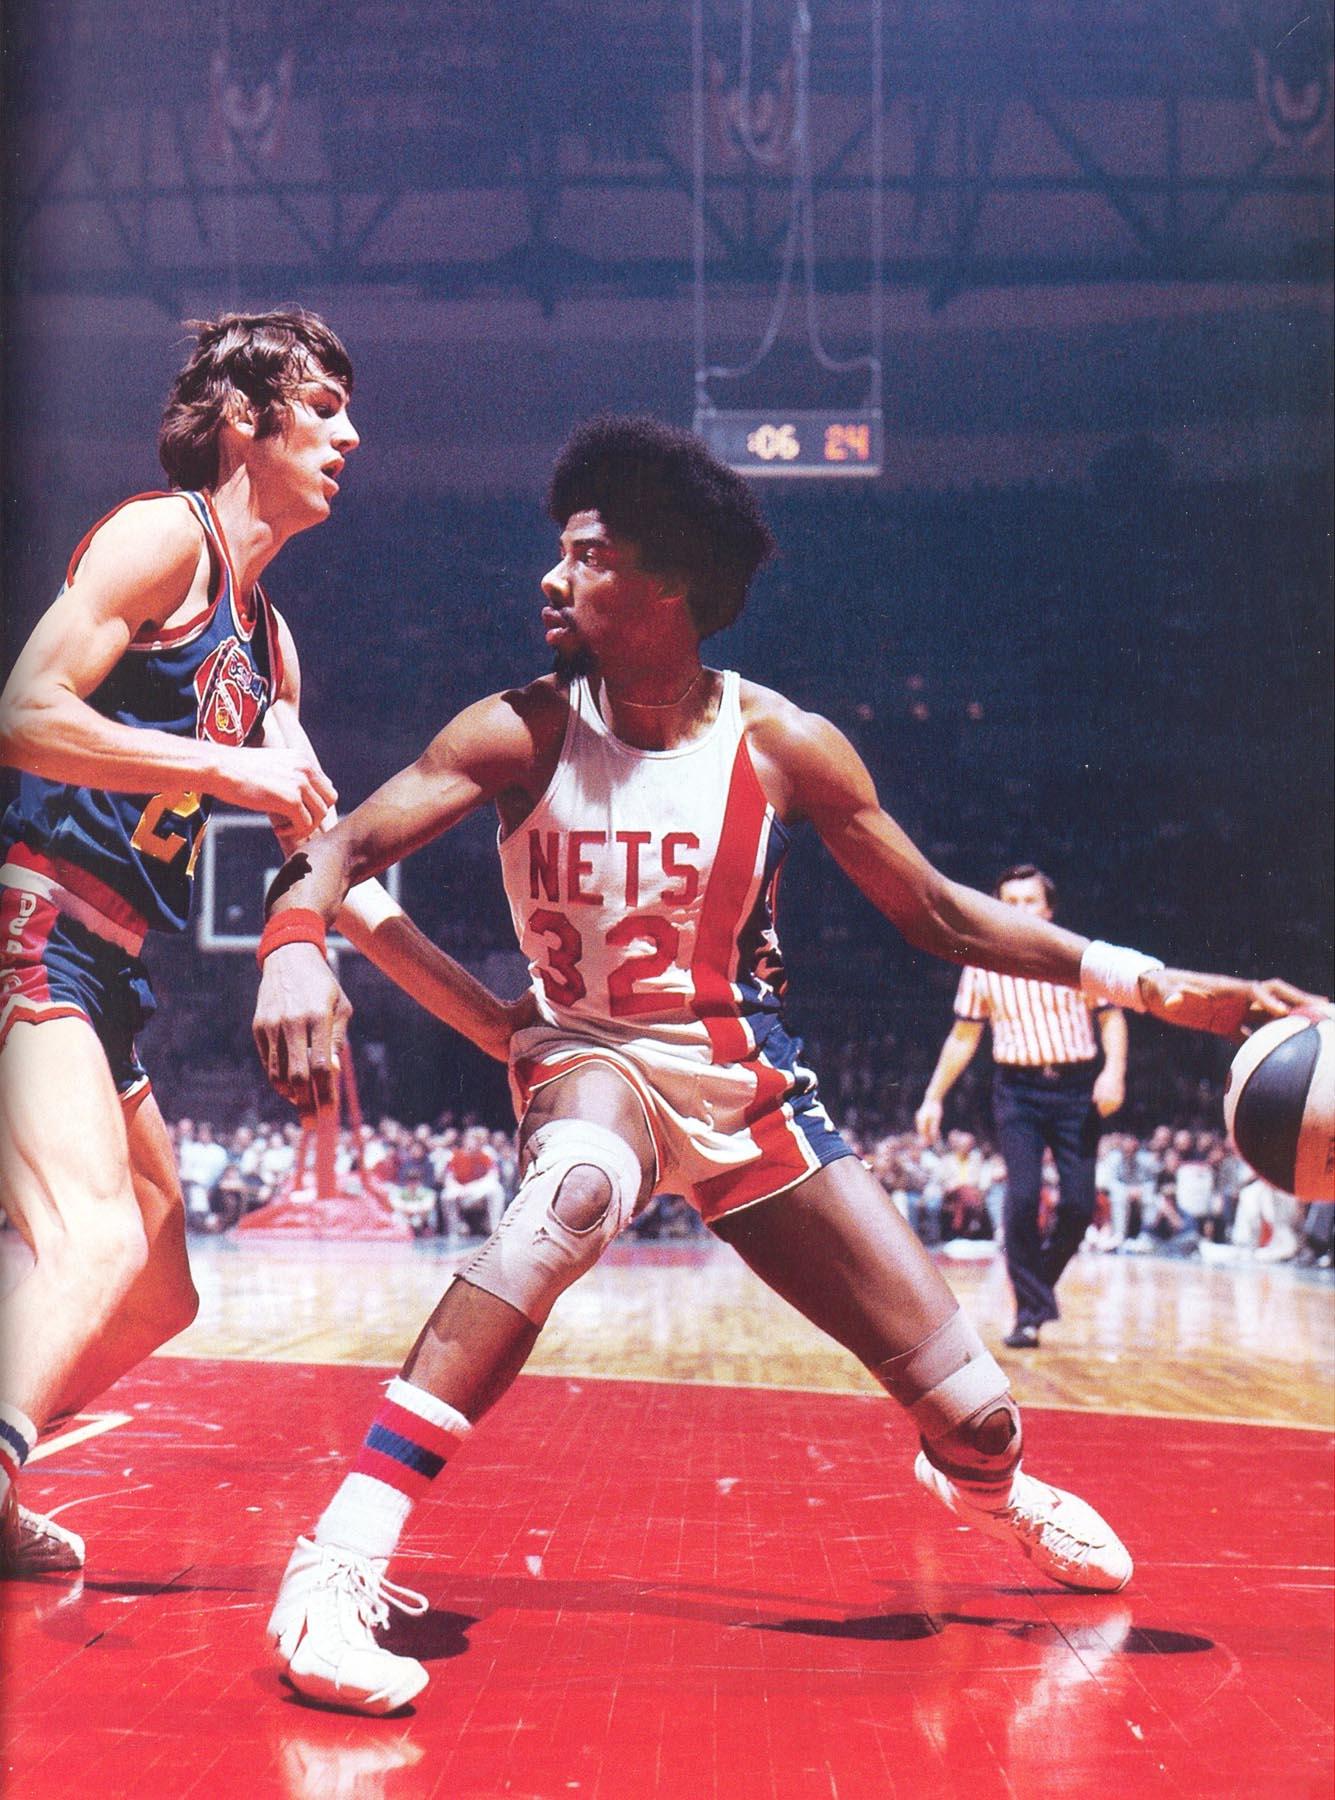 Nets 75 76 Home Julius Erving Nug s Bobby Jones